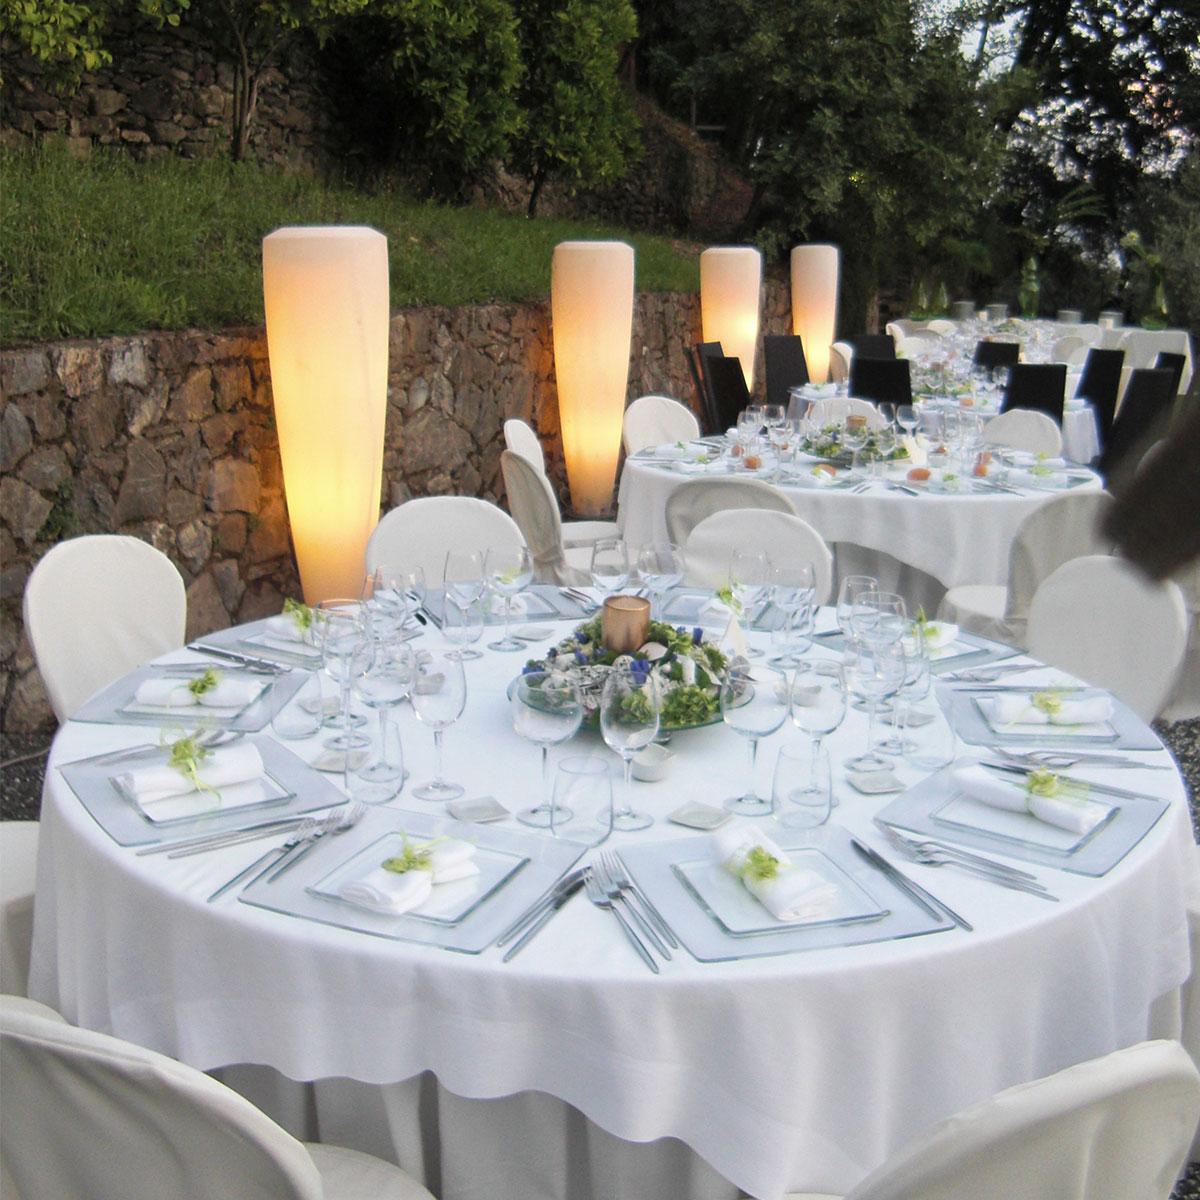 Mise en place matrimoni | Negriricevimenti.com